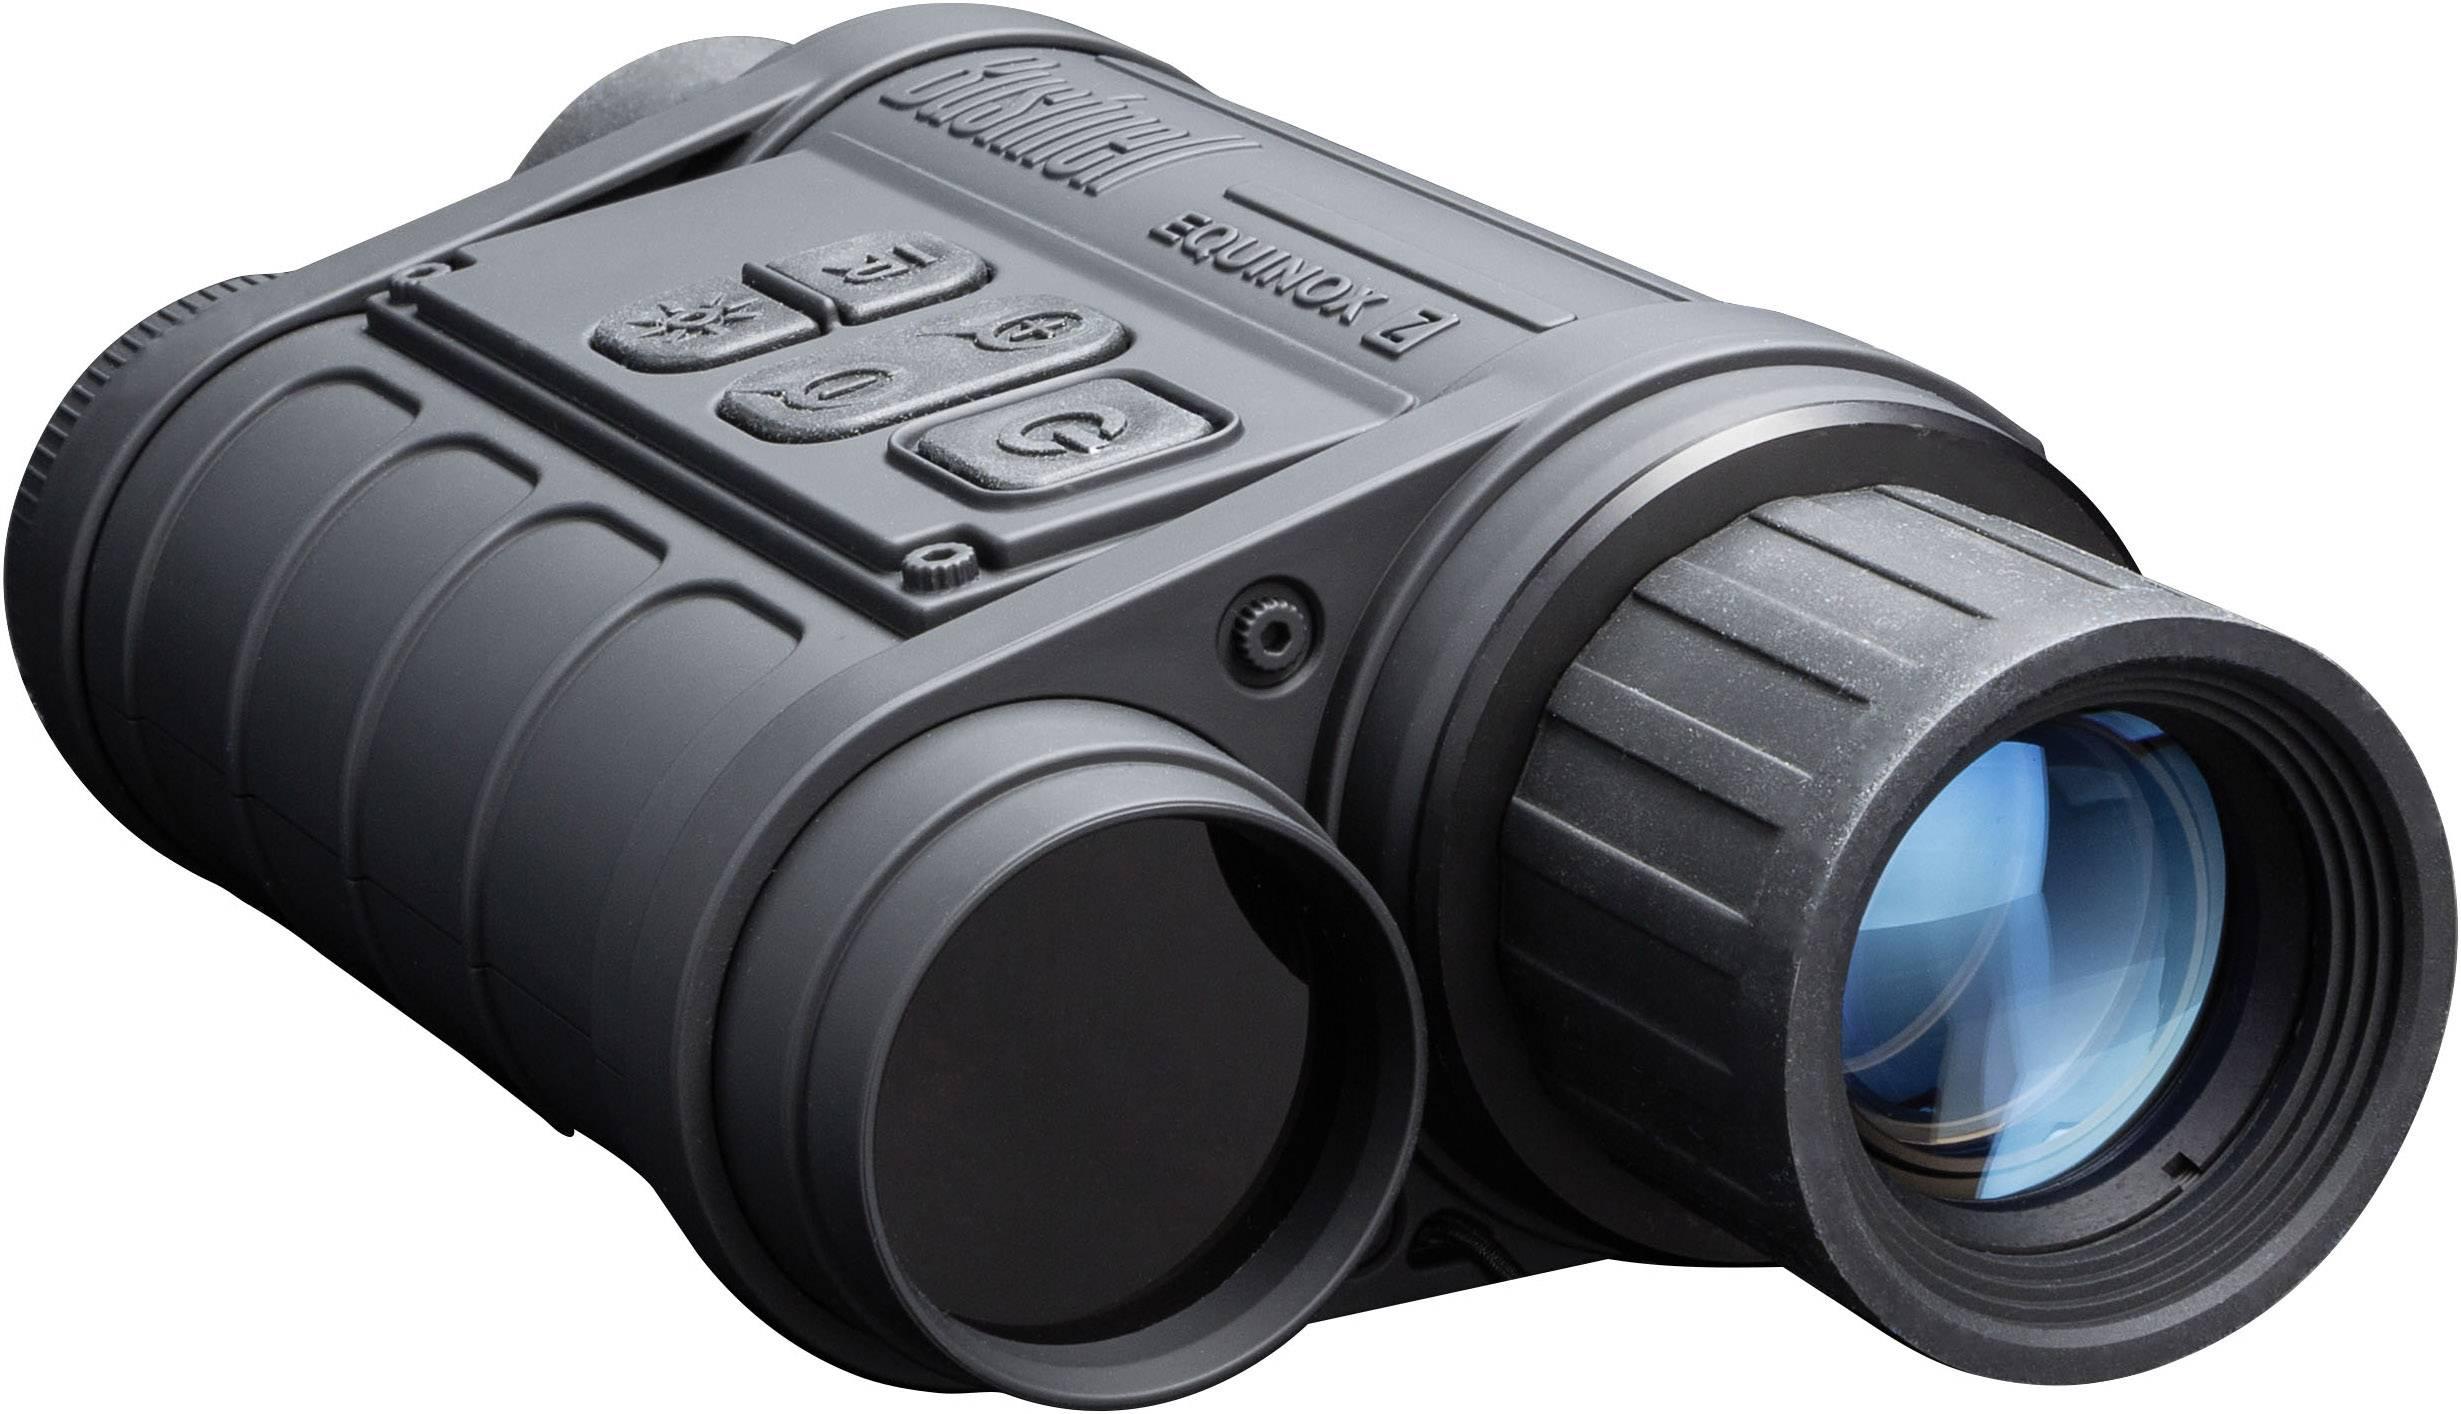 Nikon entfernungsmesser aculon al11 bedienungsanleitung: nikon